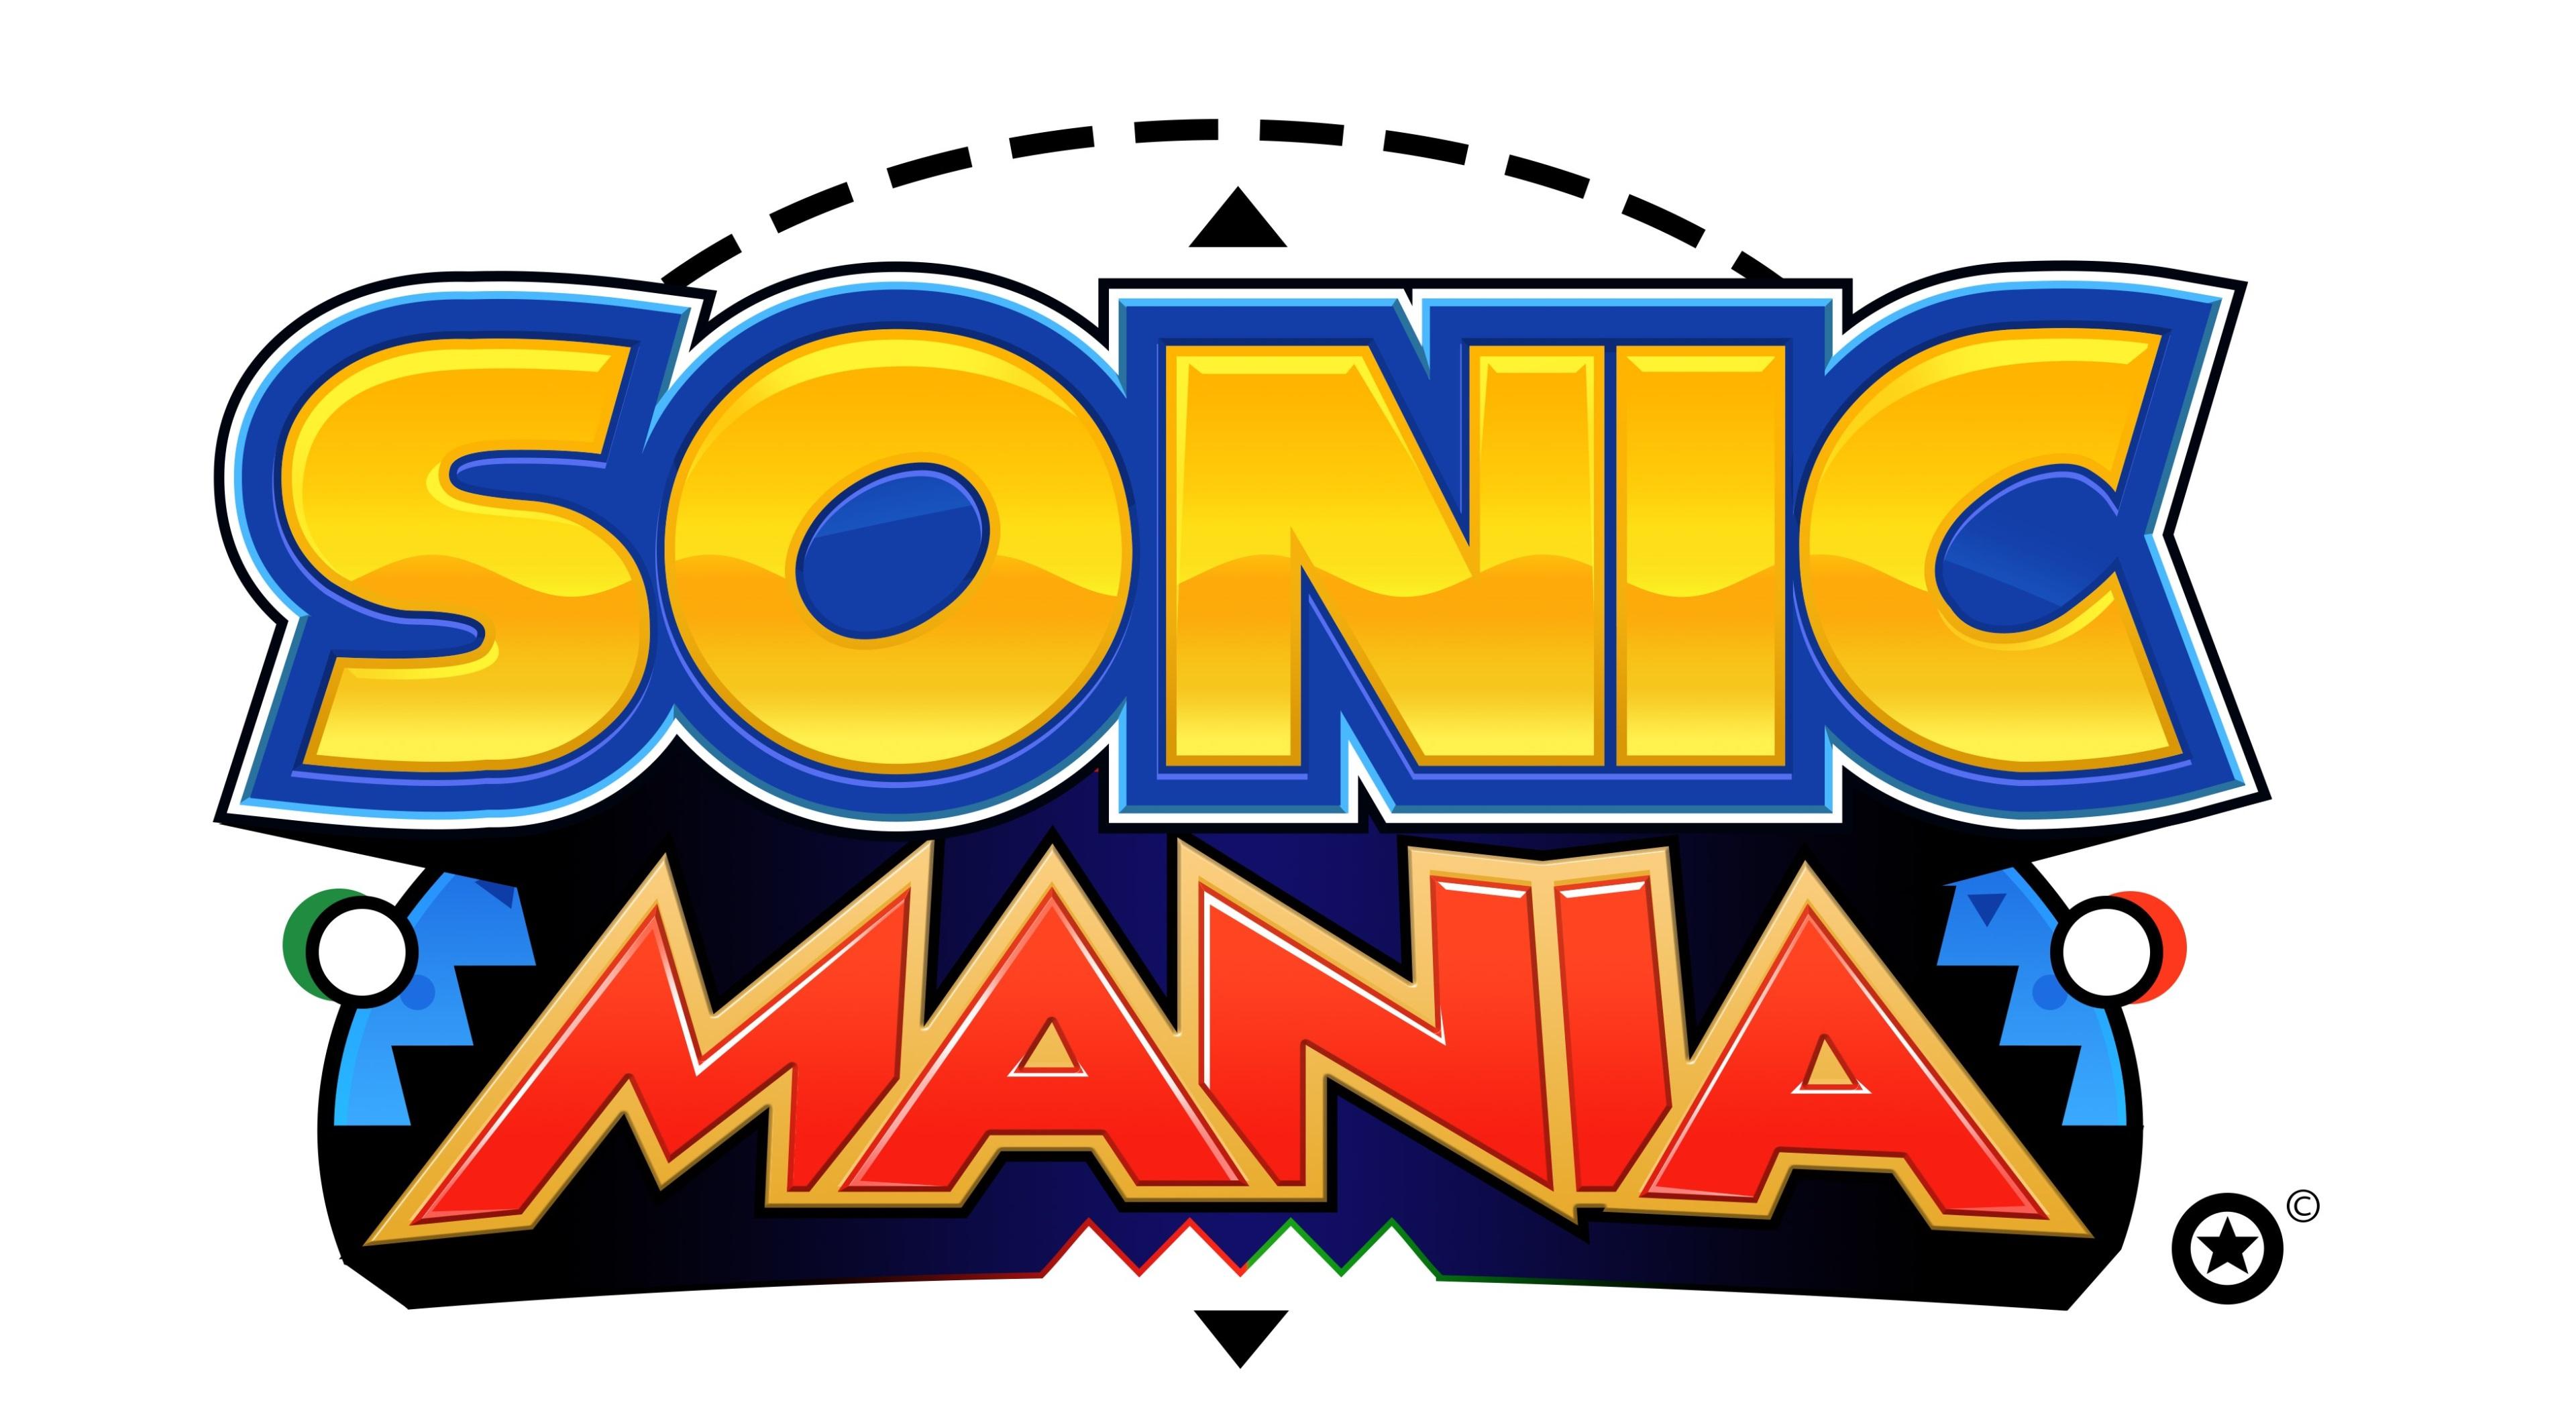 Sonic Mania 4k Free Desktop Wallpaper.